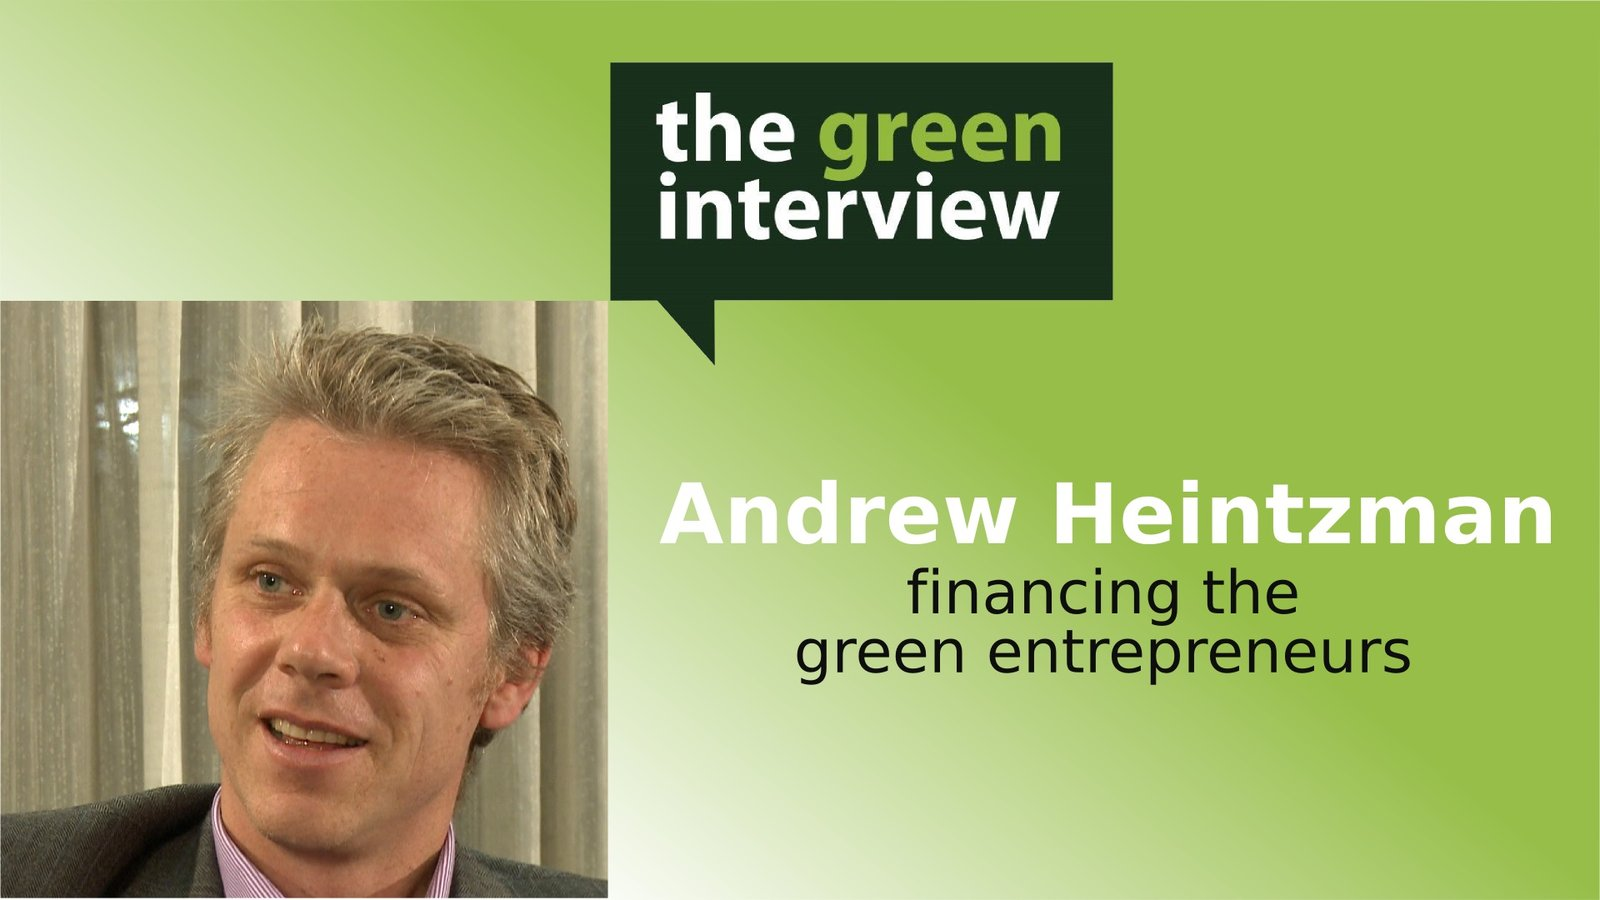 Andrew Heintzman: Financing the Green Entrepreneurs